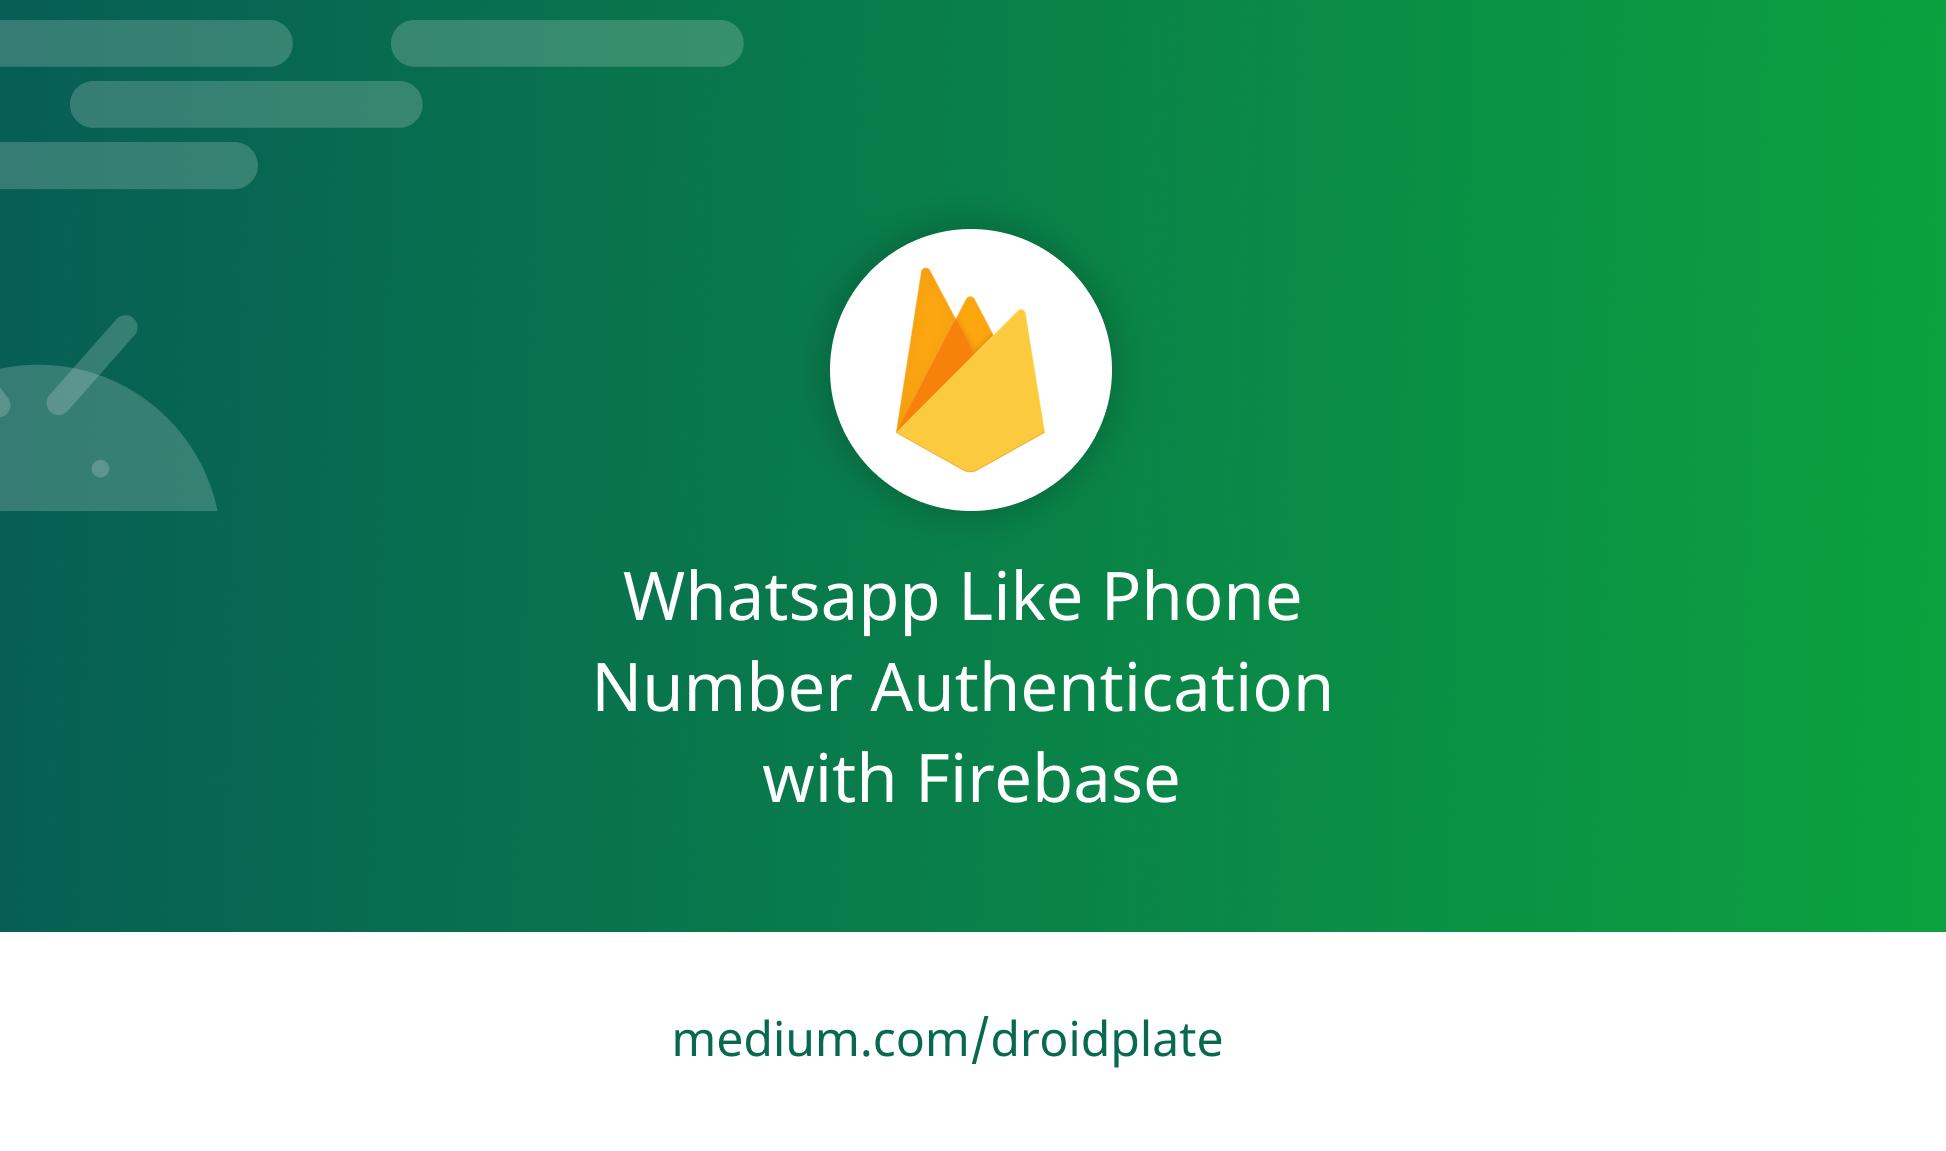 Whatsapp-Like Phone Number Authentication withFirebase